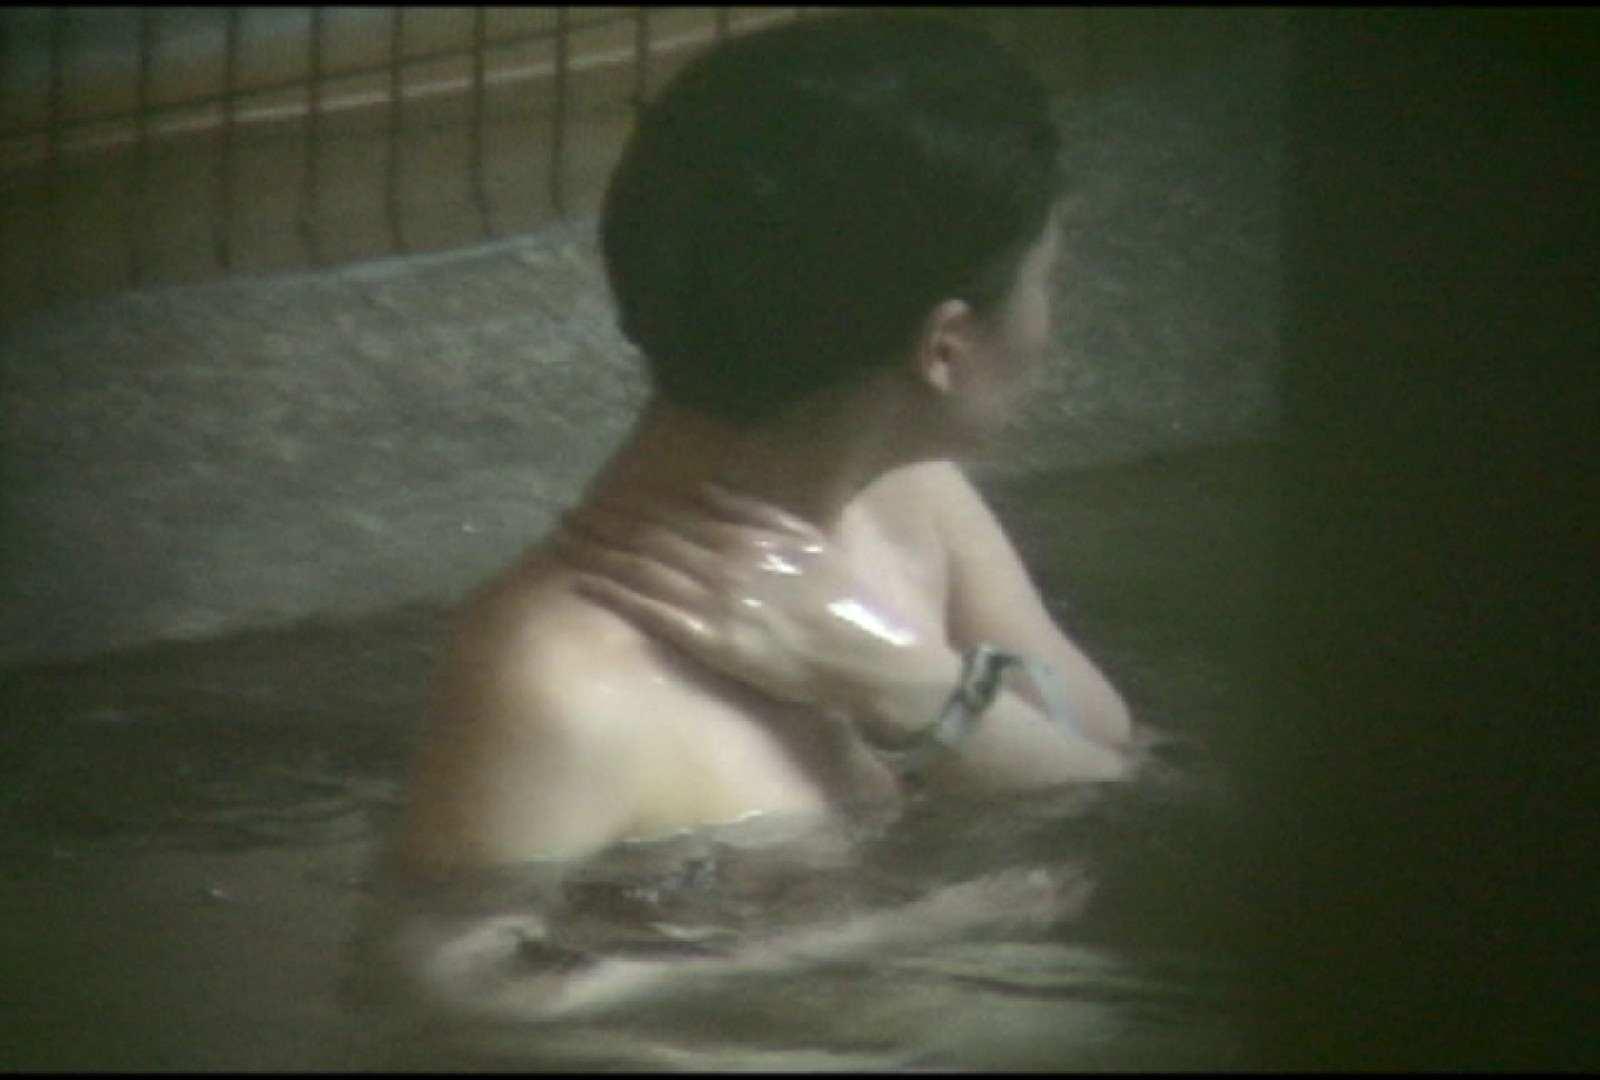 Aquaな露天風呂Vol.699 盗撮師作品 AV無料 101pic 41